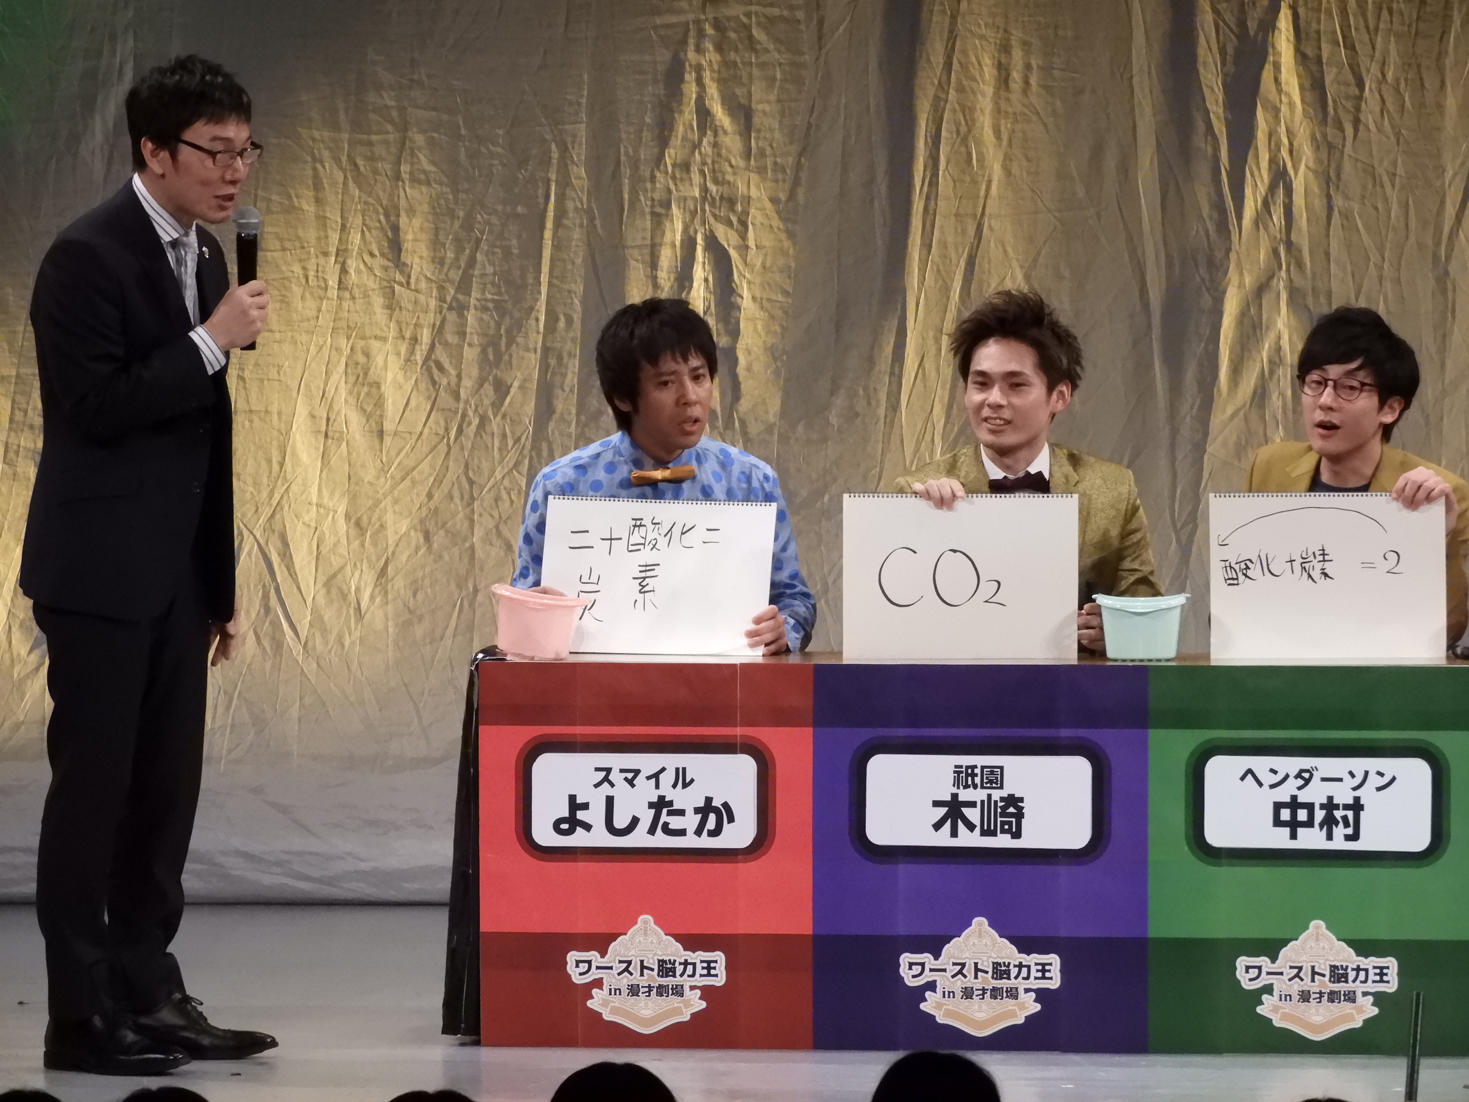 http://news.yoshimoto.co.jp/20180406111940-2f9976aaac0bd43d35ef63563f9109d743f0c71c.jpg